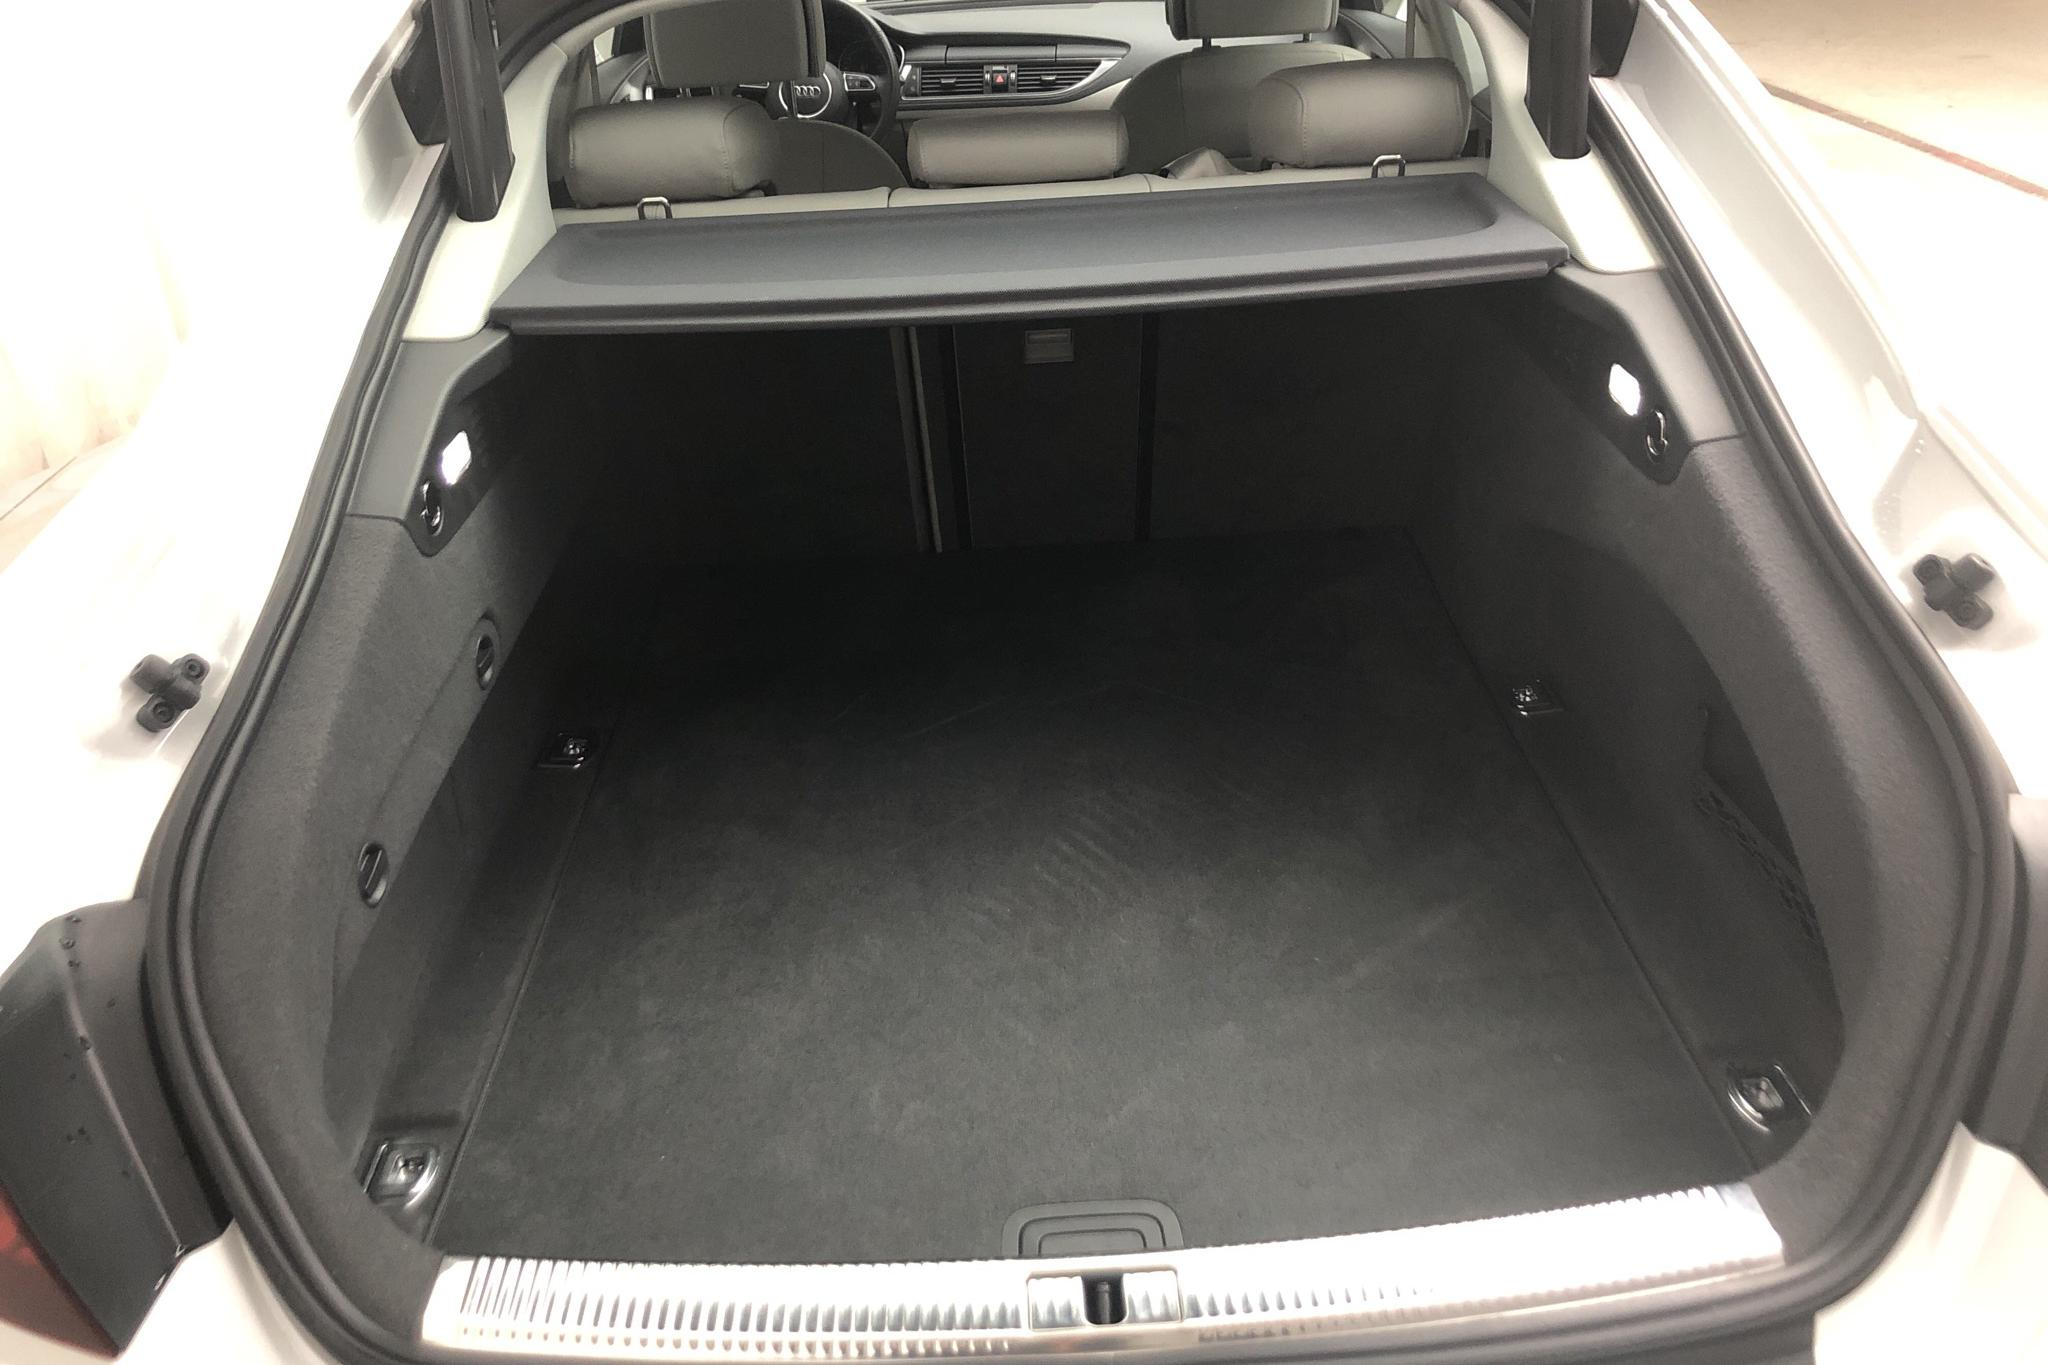 Audi A7 2.0 TFSI Sportback quattro (252hk) - 44 350 km - Automatic - white - 2018